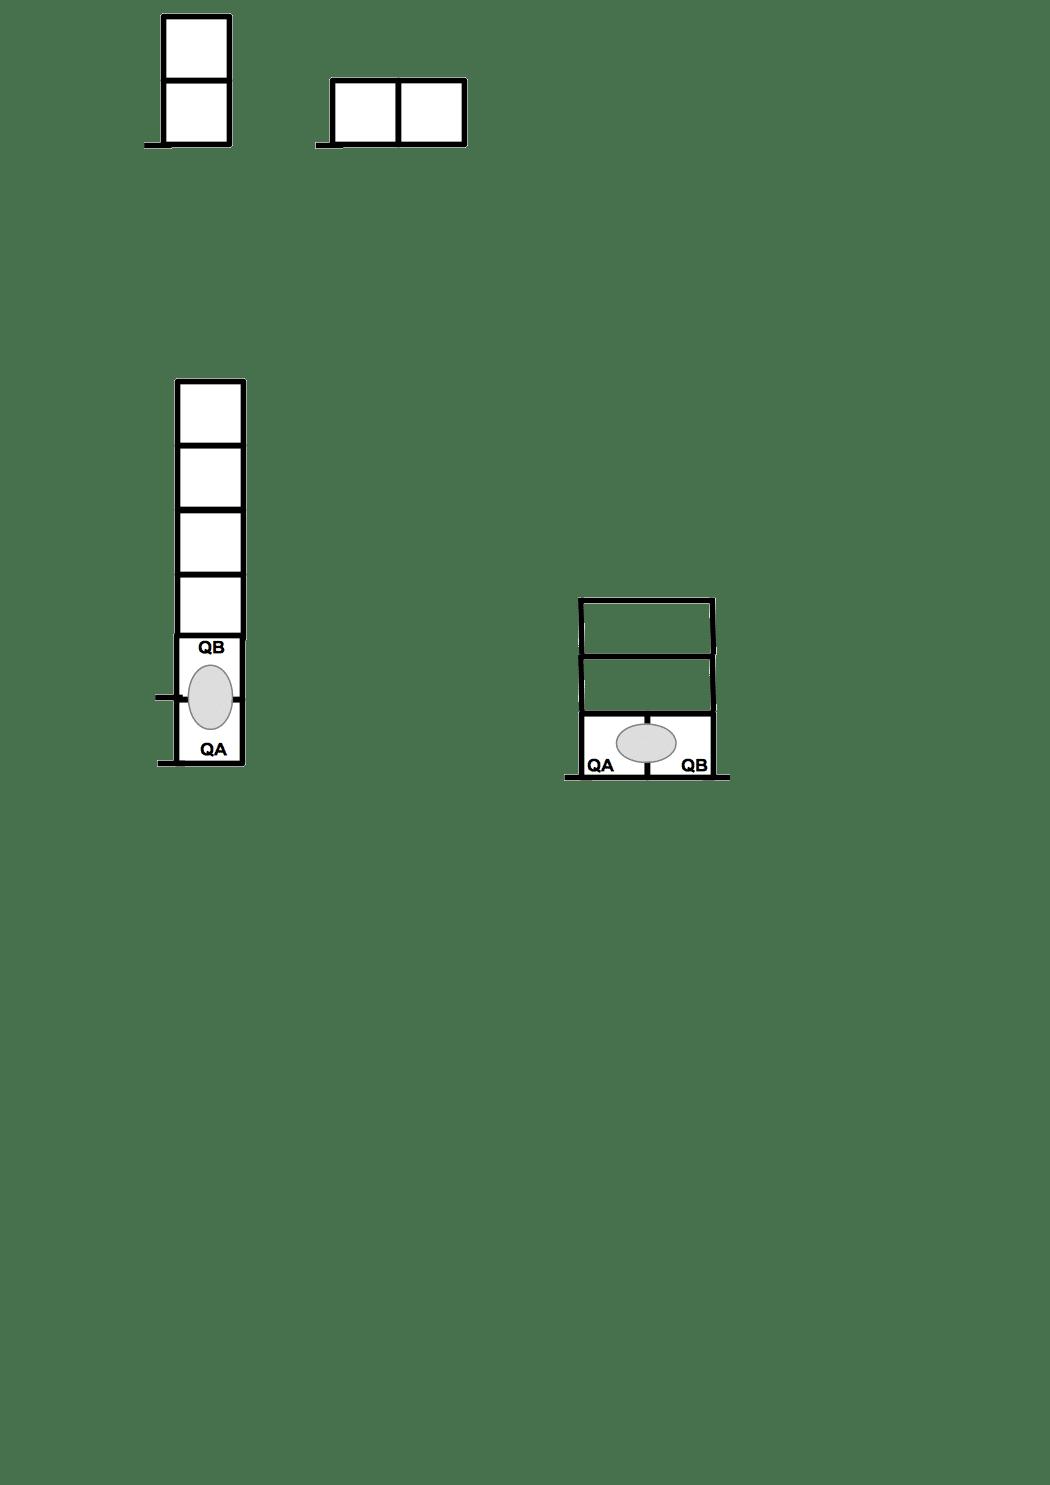 horiz-vs-vert-1